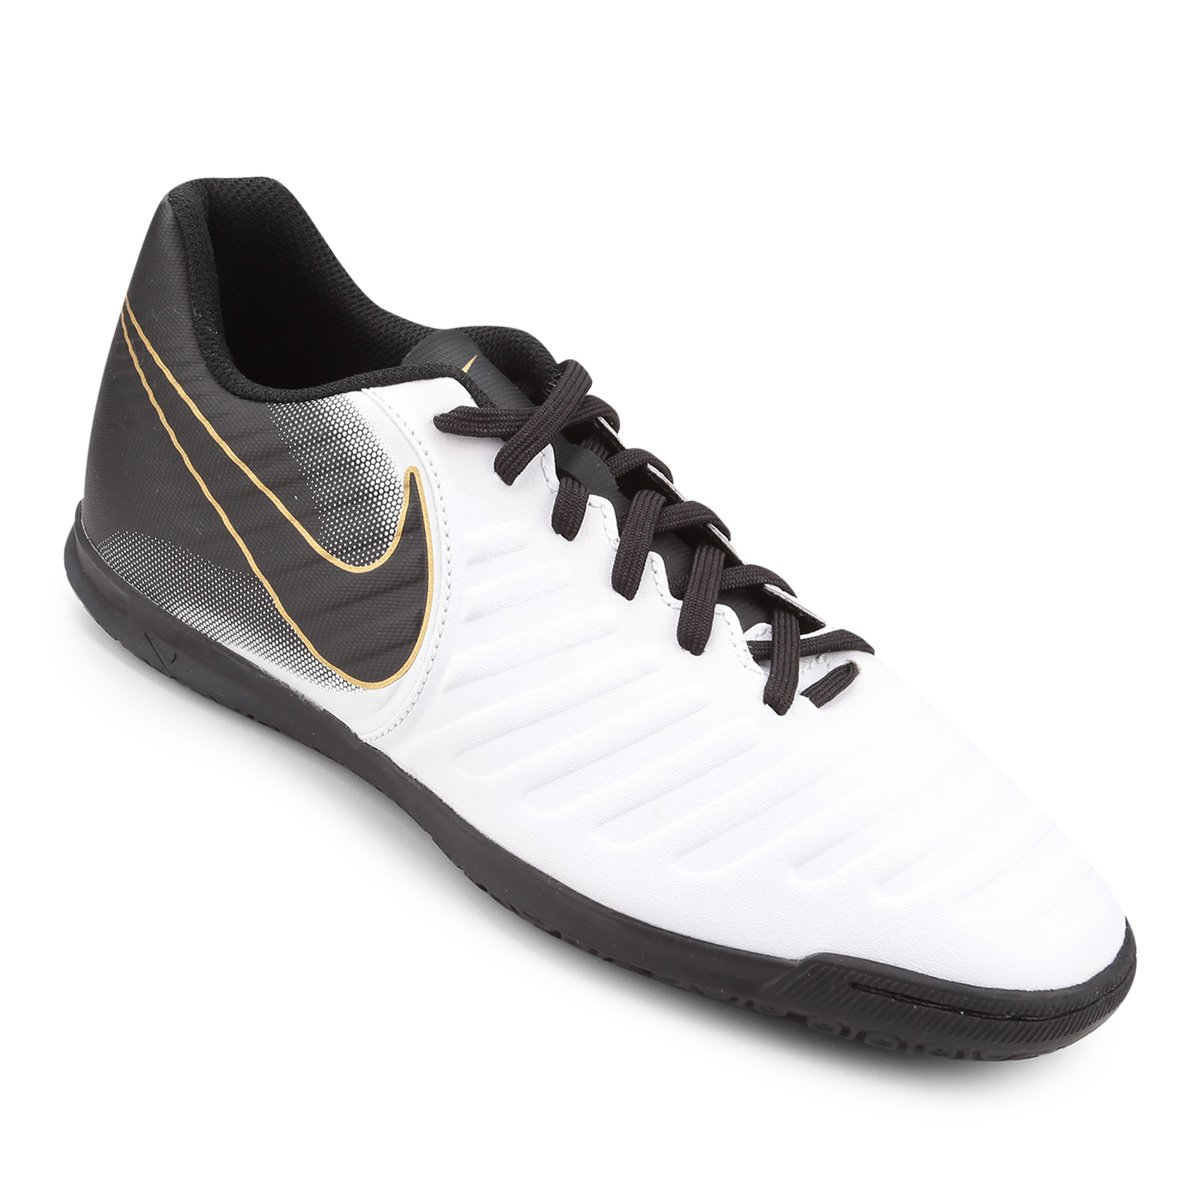 7c8dd53773 Chuteira Futsal Nike Tiempo Legend 7 Club IC - Branco e Preto